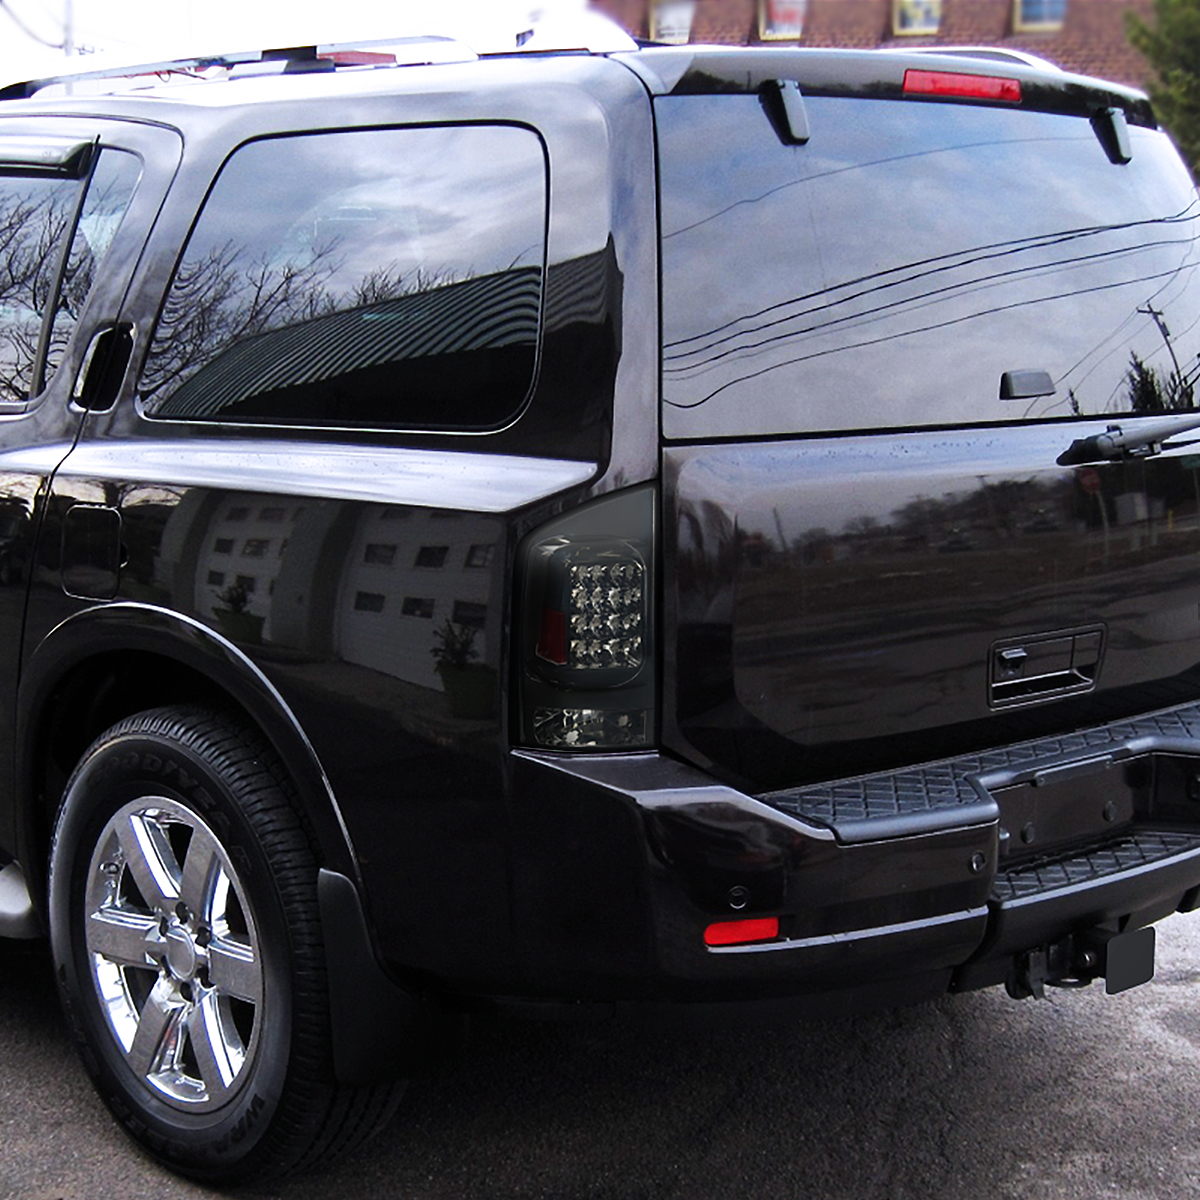 EFL 4x Front Rear Splash Guards Mud Flaps Fender For 2005-2016 Volkswagen Tiguan